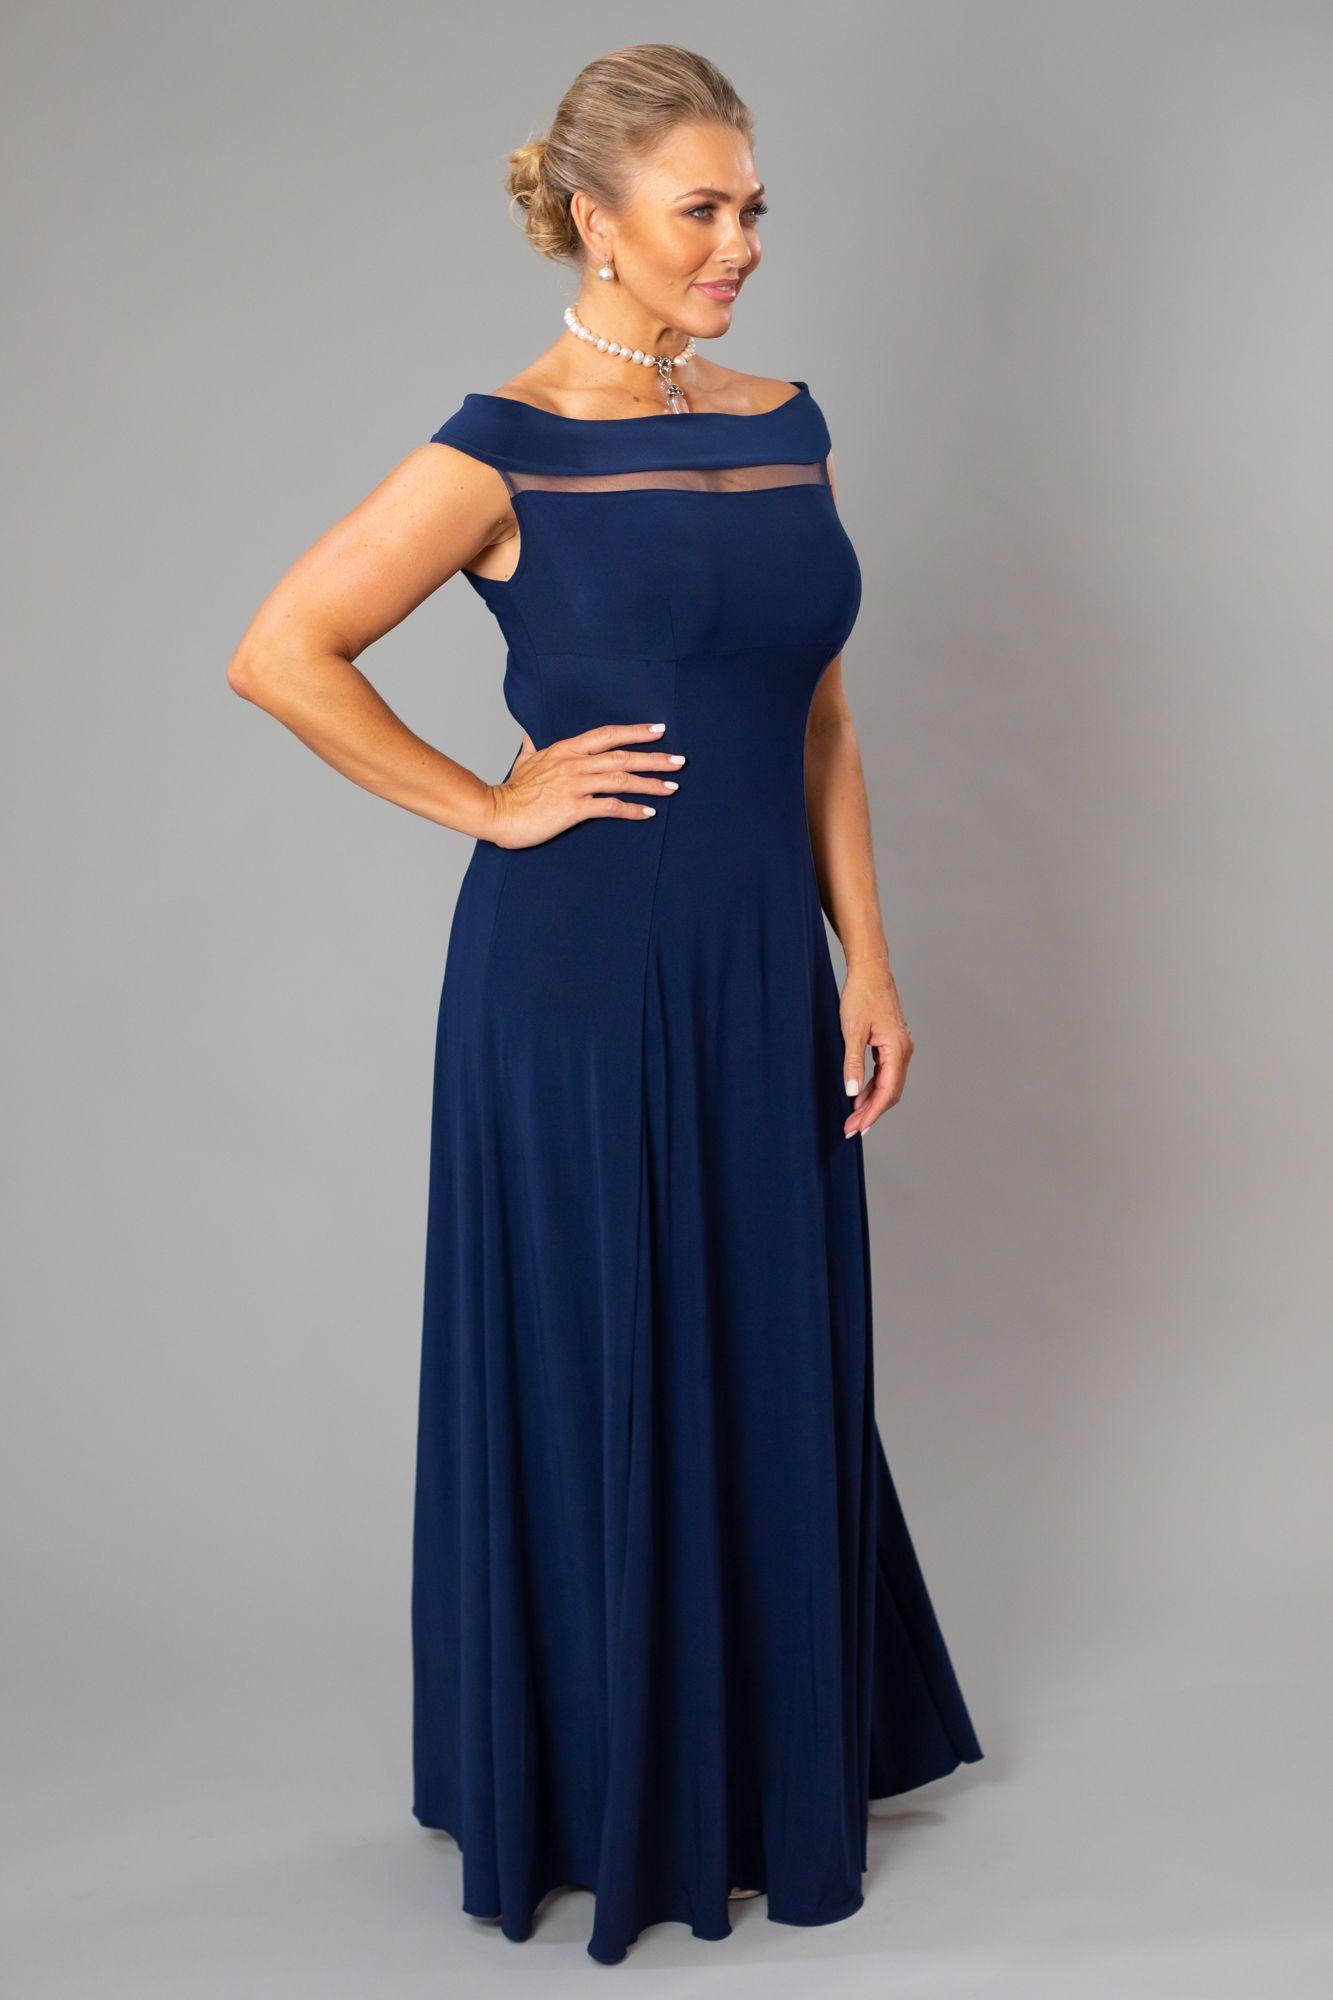 12+ Navy blue mother of the groom dress ideas ideas